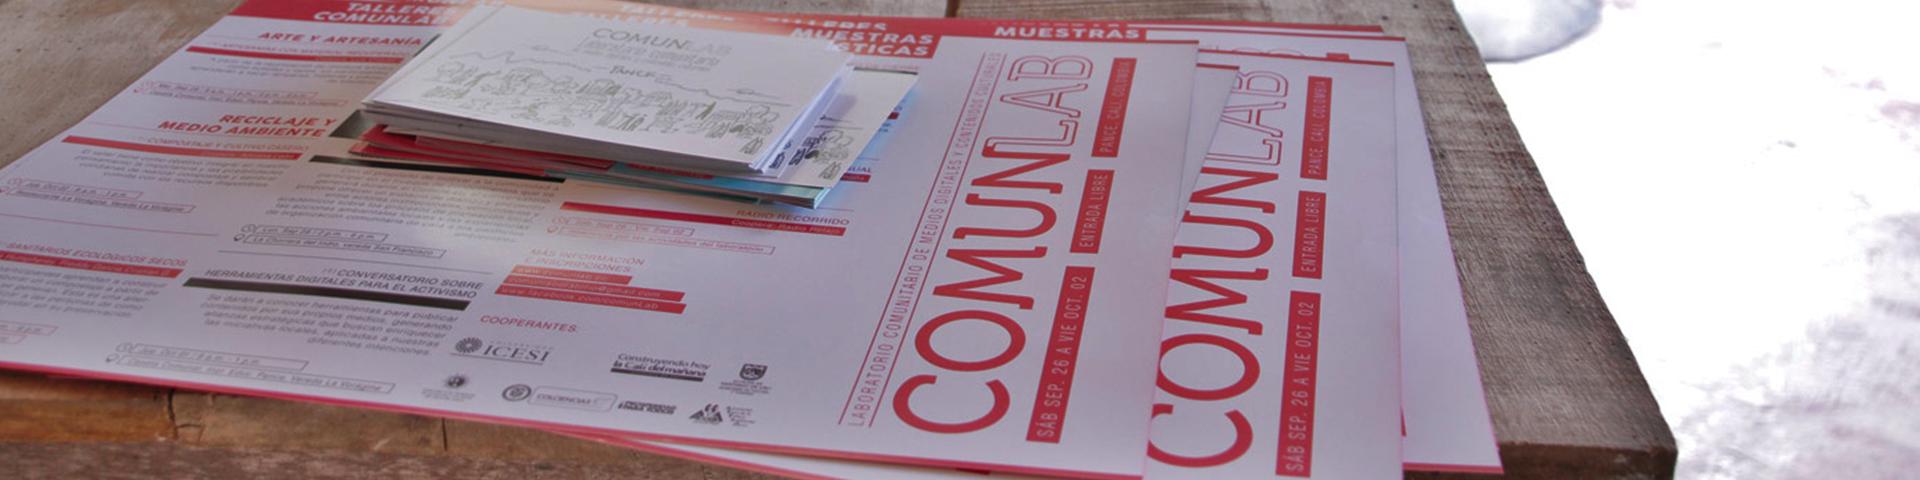 ComunLAB 2015